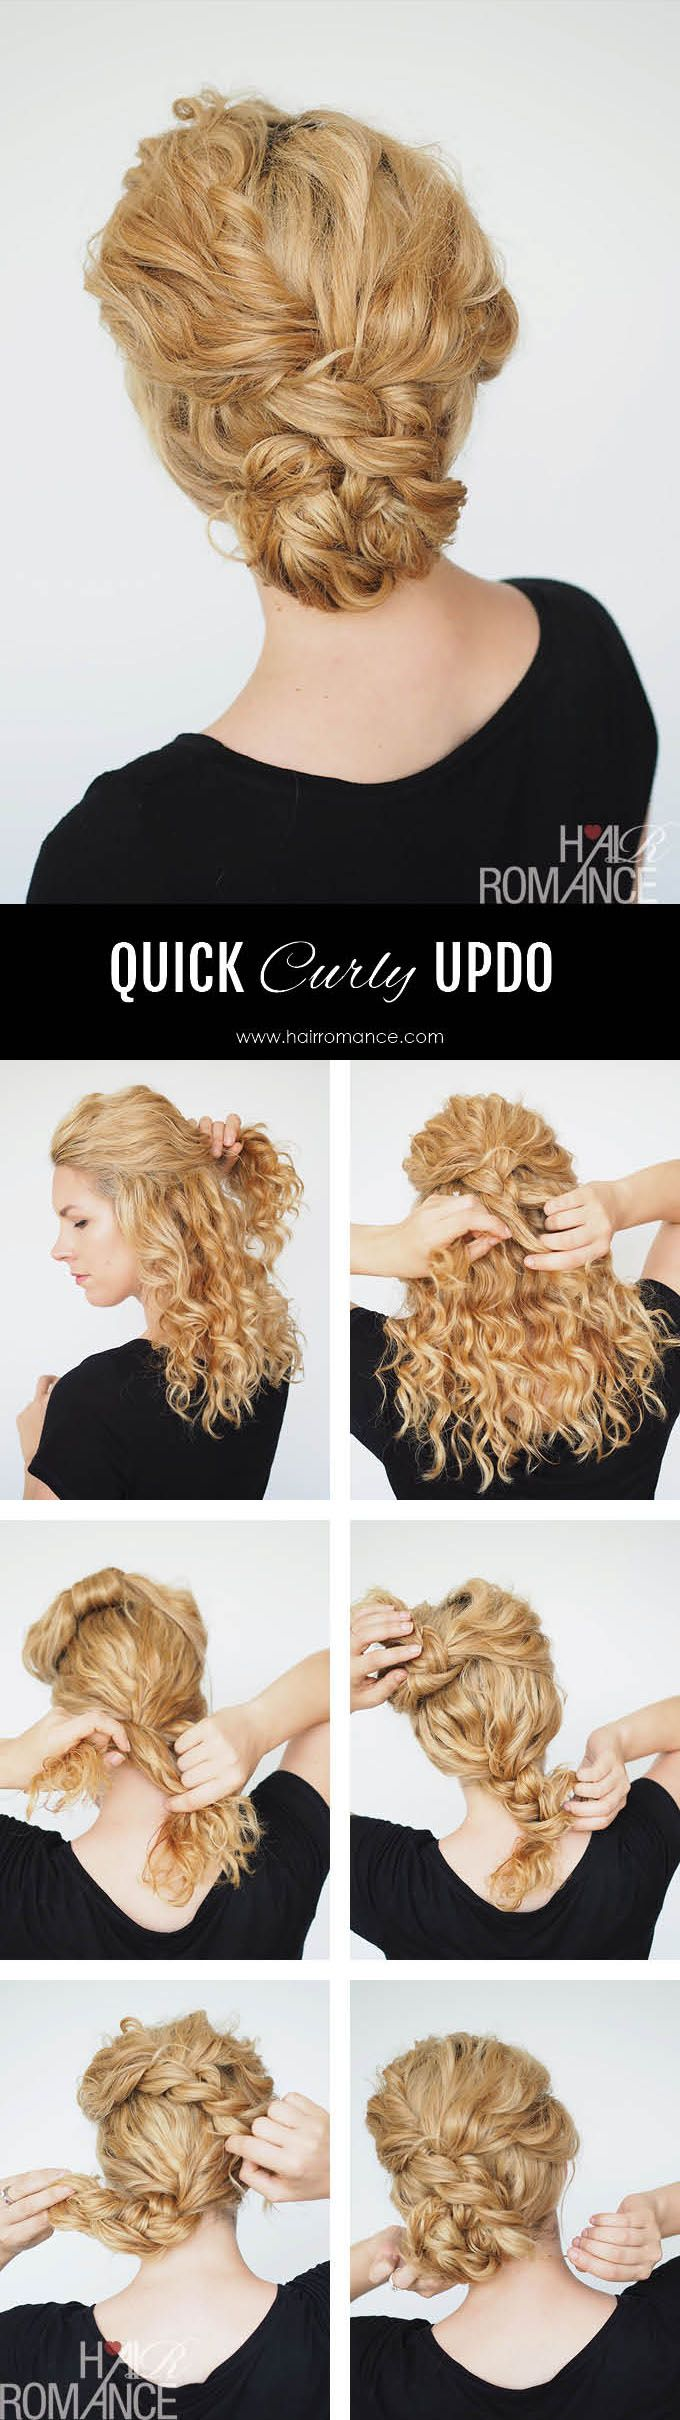 2 min updo for curly hair hair romance pinterest updo curly 2 min updo for curly hair hair romance bloglovin solutioingenieria Images